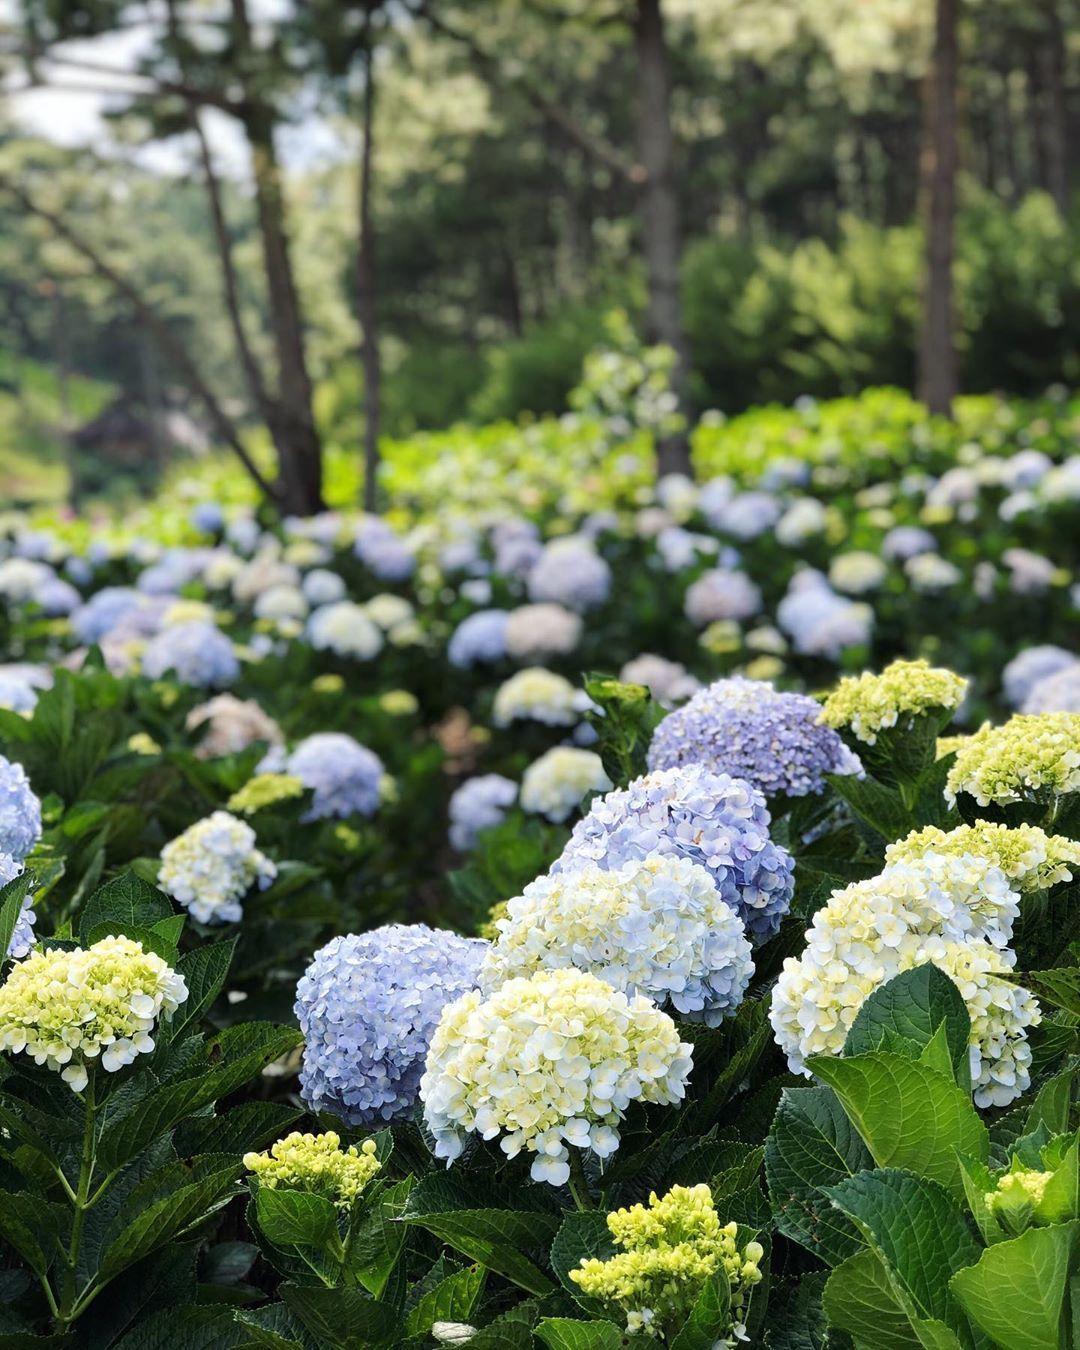 Hydrangea Garden In Dalat Vietnam Dalat Garden Hydrangea Vietnam In 2020 Hydrangea Garden Hydrangea Outdoor Gardens